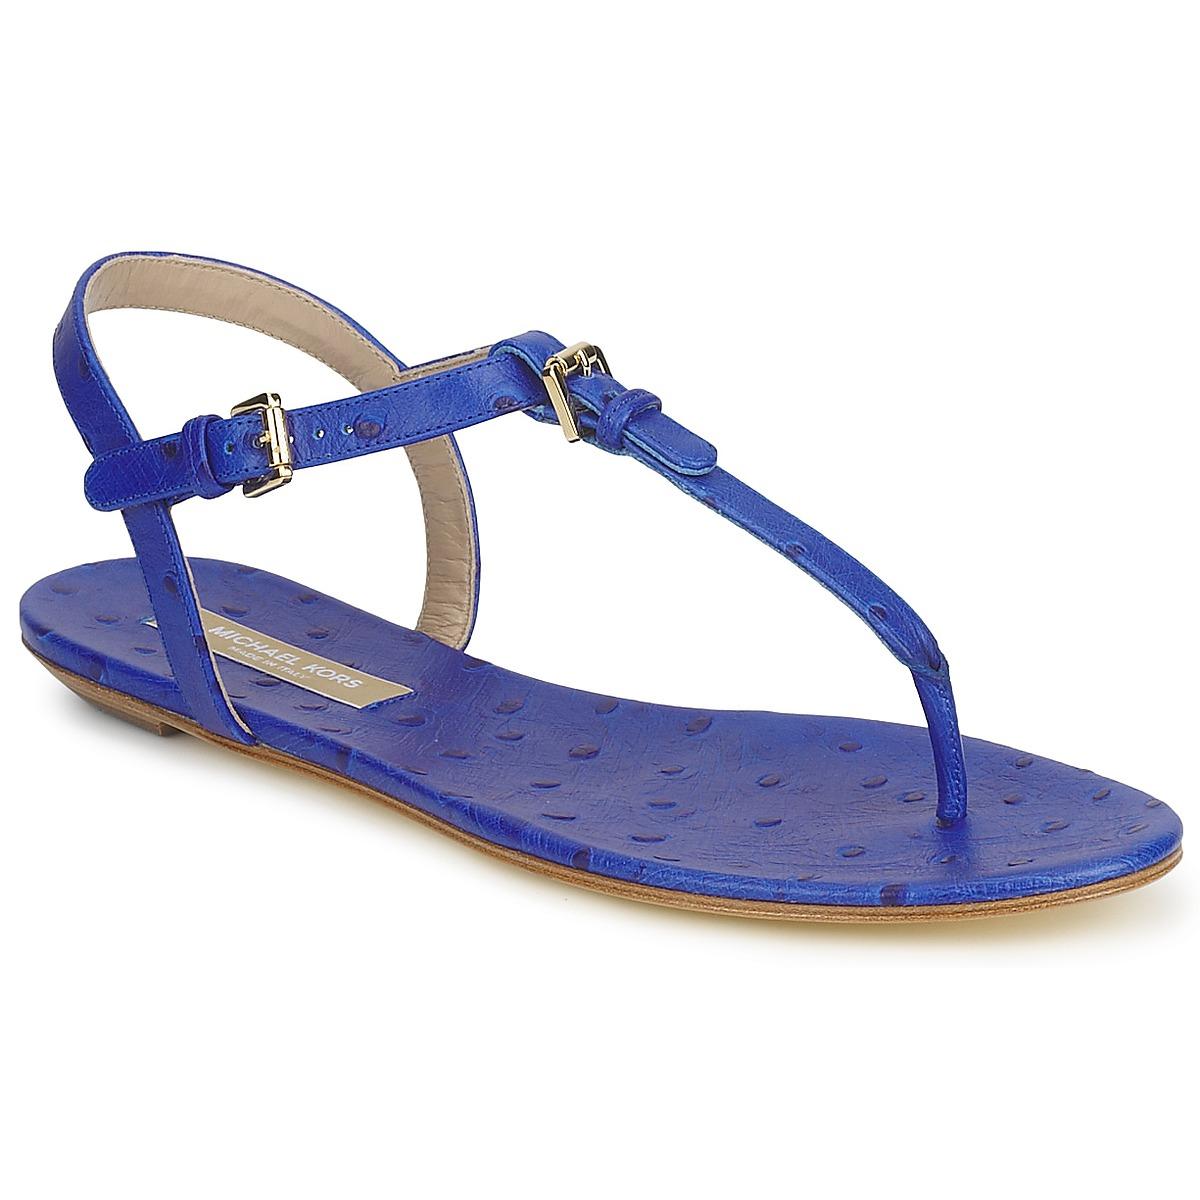 Sandale Michael Kors FOULARD Bleu